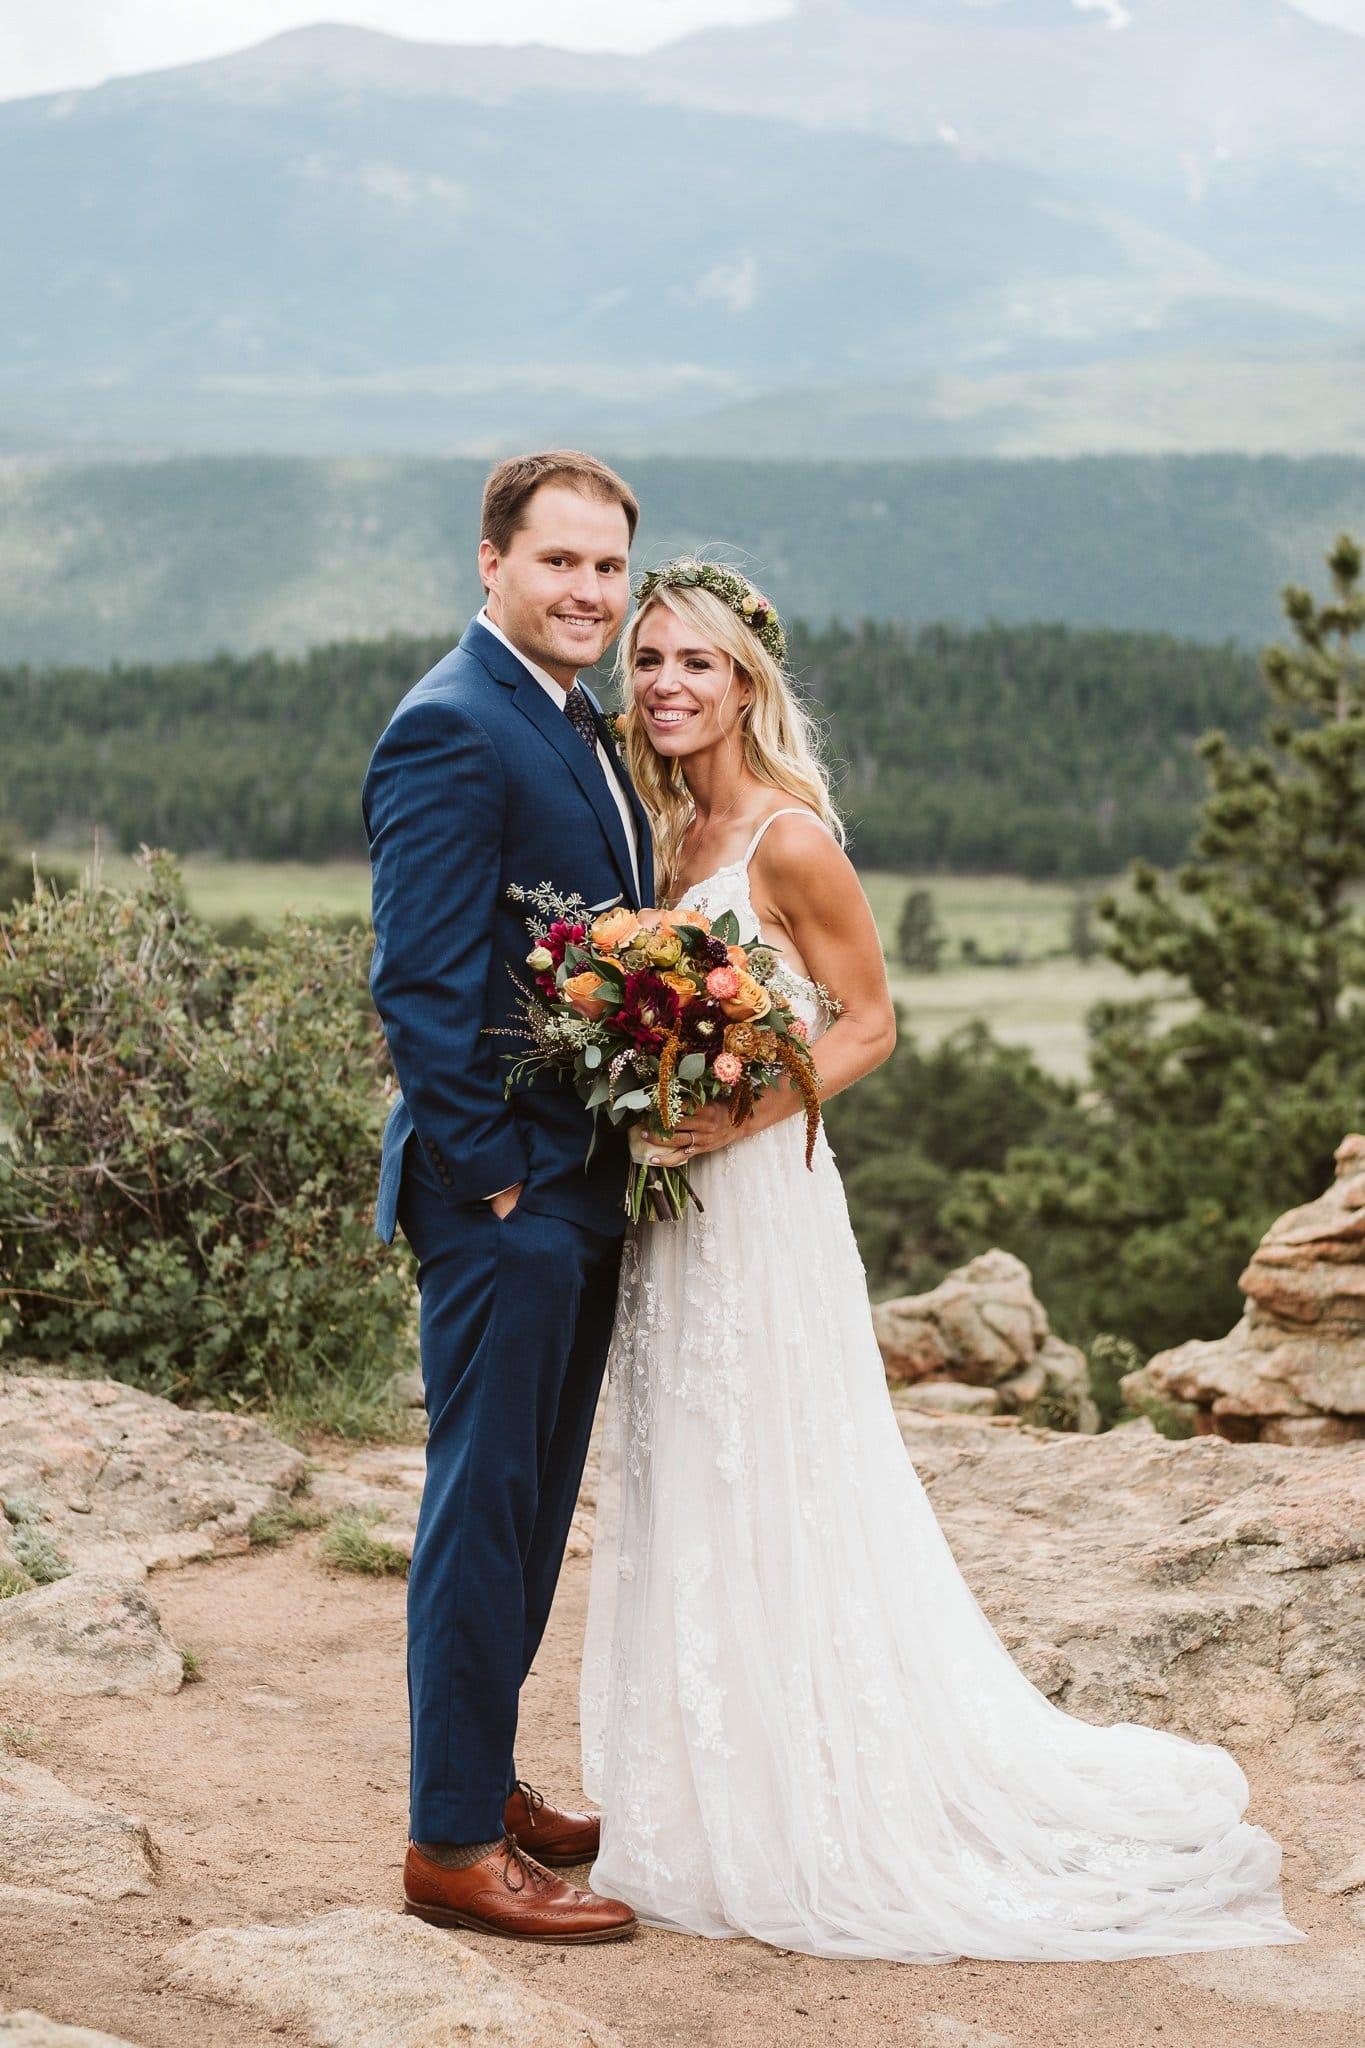 Wedding photos at 3M Curve in Rocky Mountain National Park, Estes Park wedding, Colorado wedding photographer, bride and groom portrait